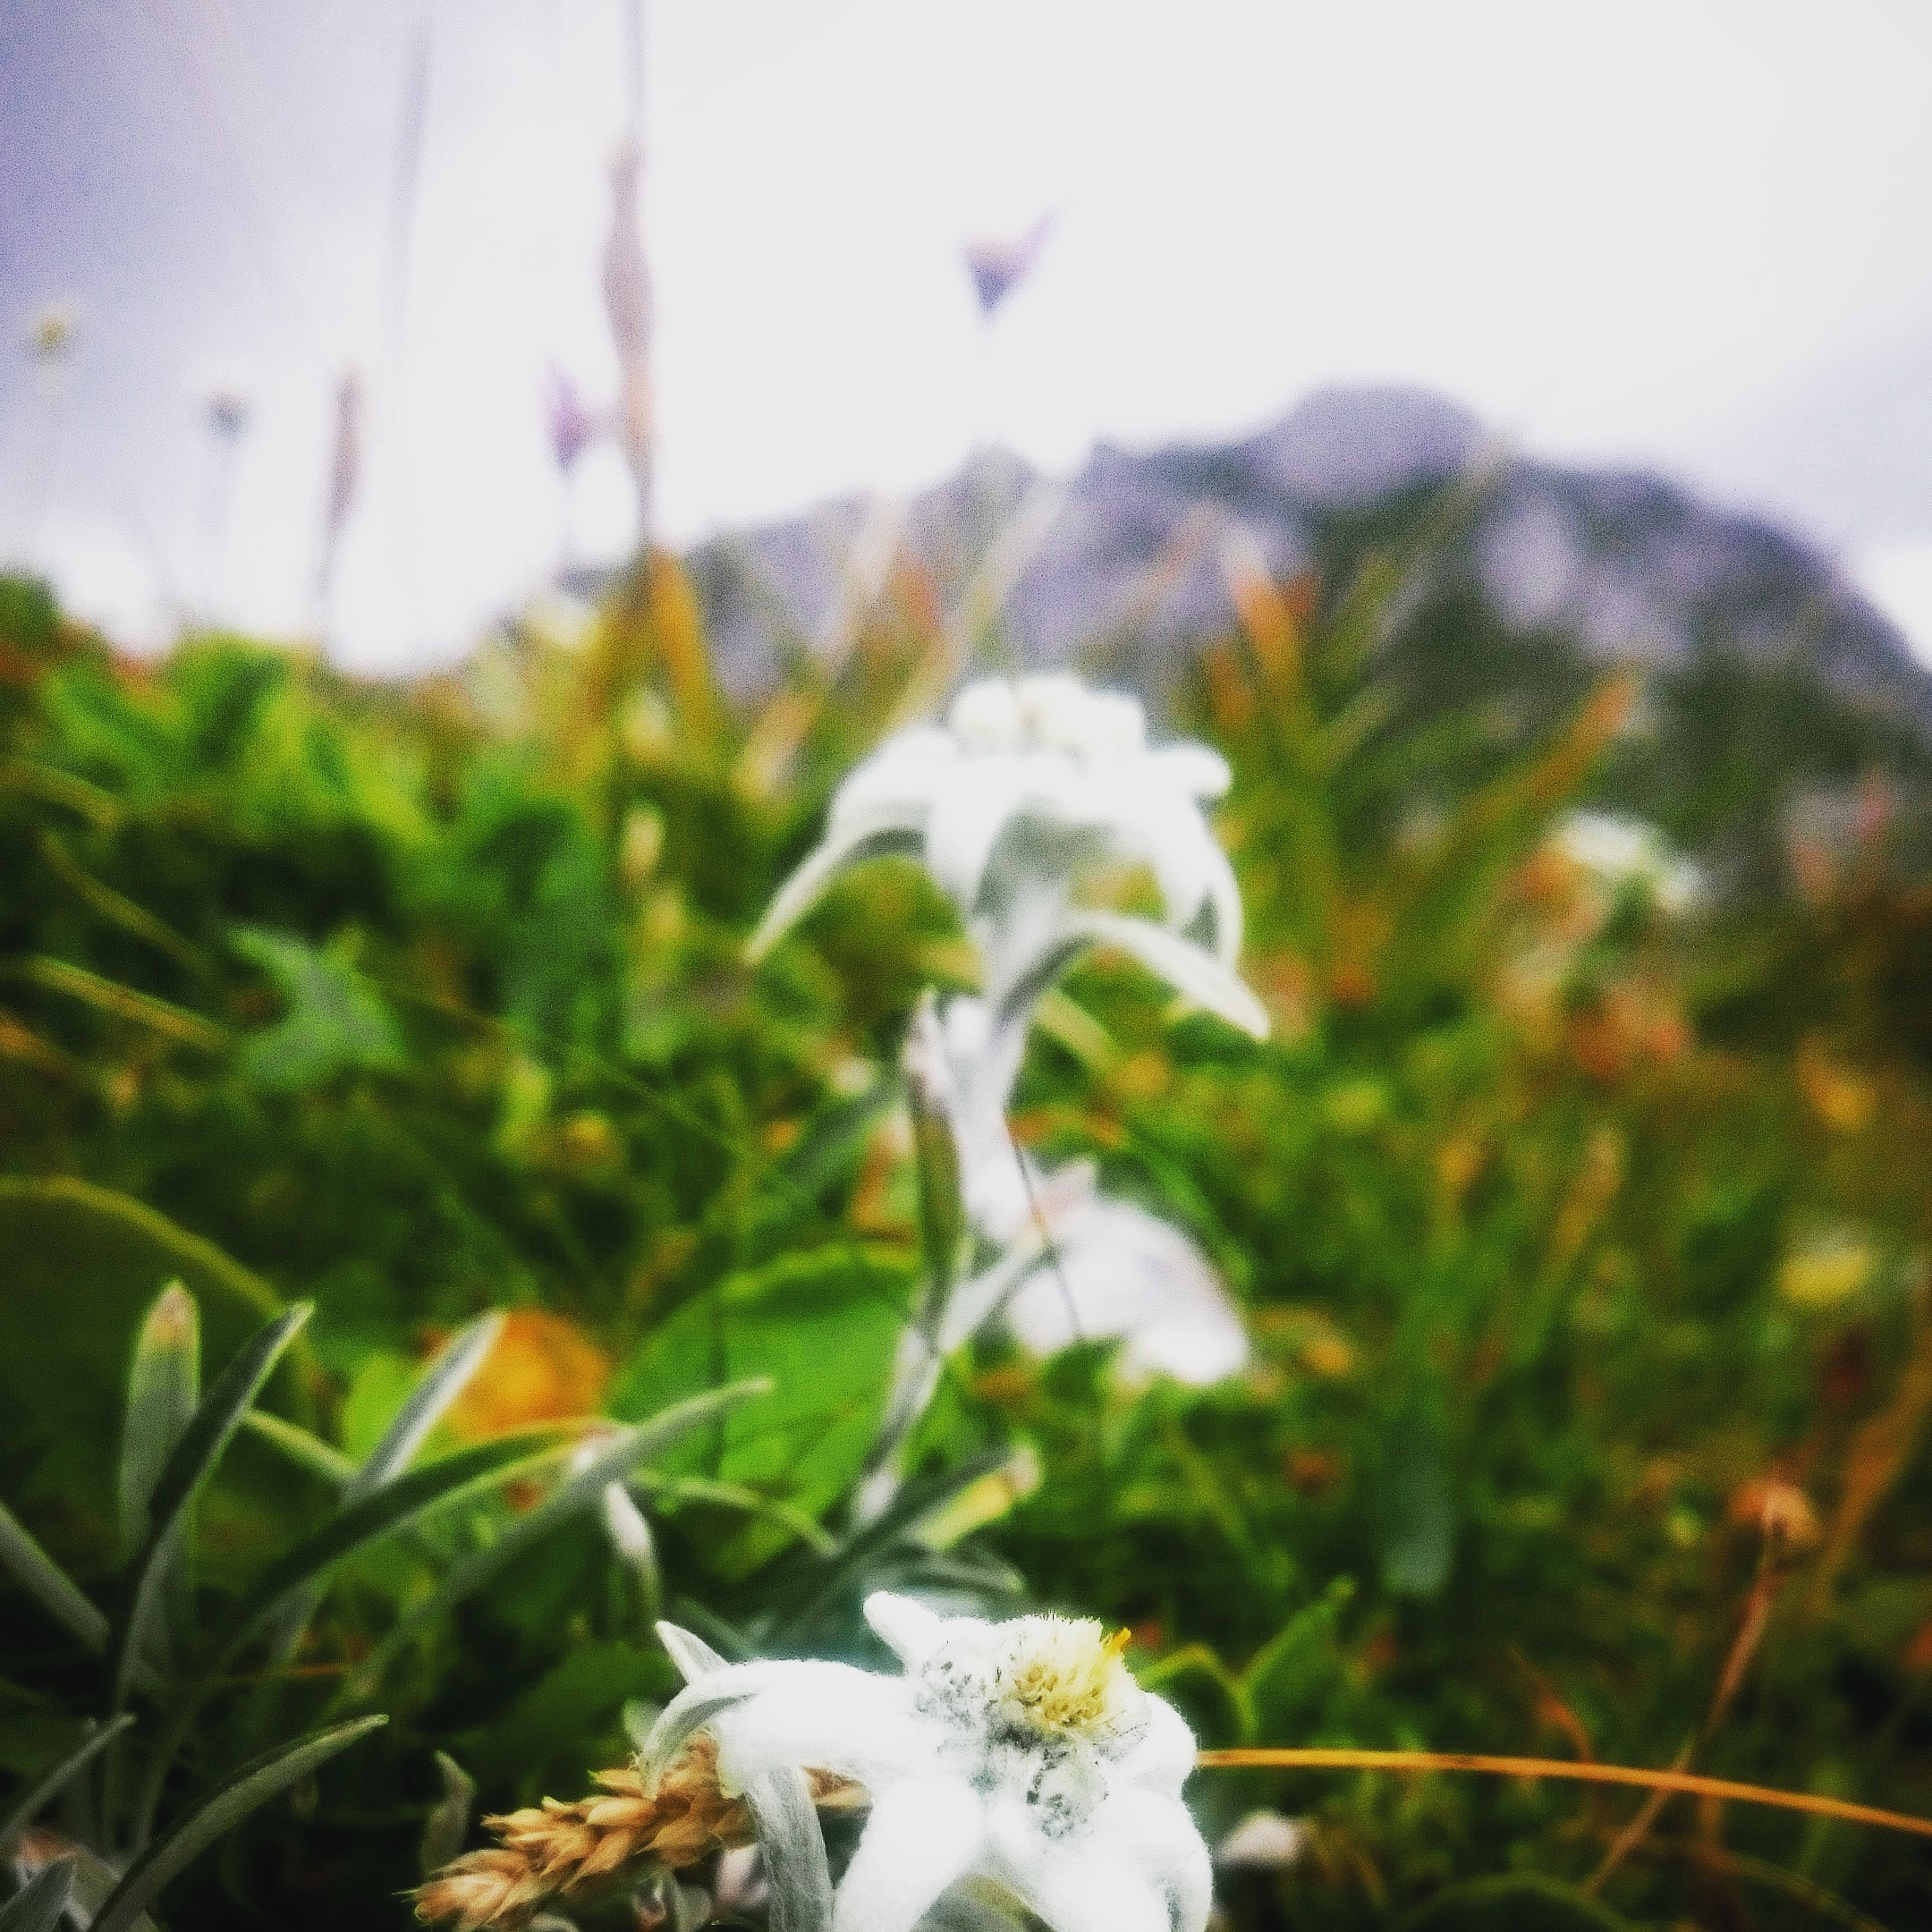 Alpenüberquerung am wunderbaren Wanderweg E5, Anreisetag.